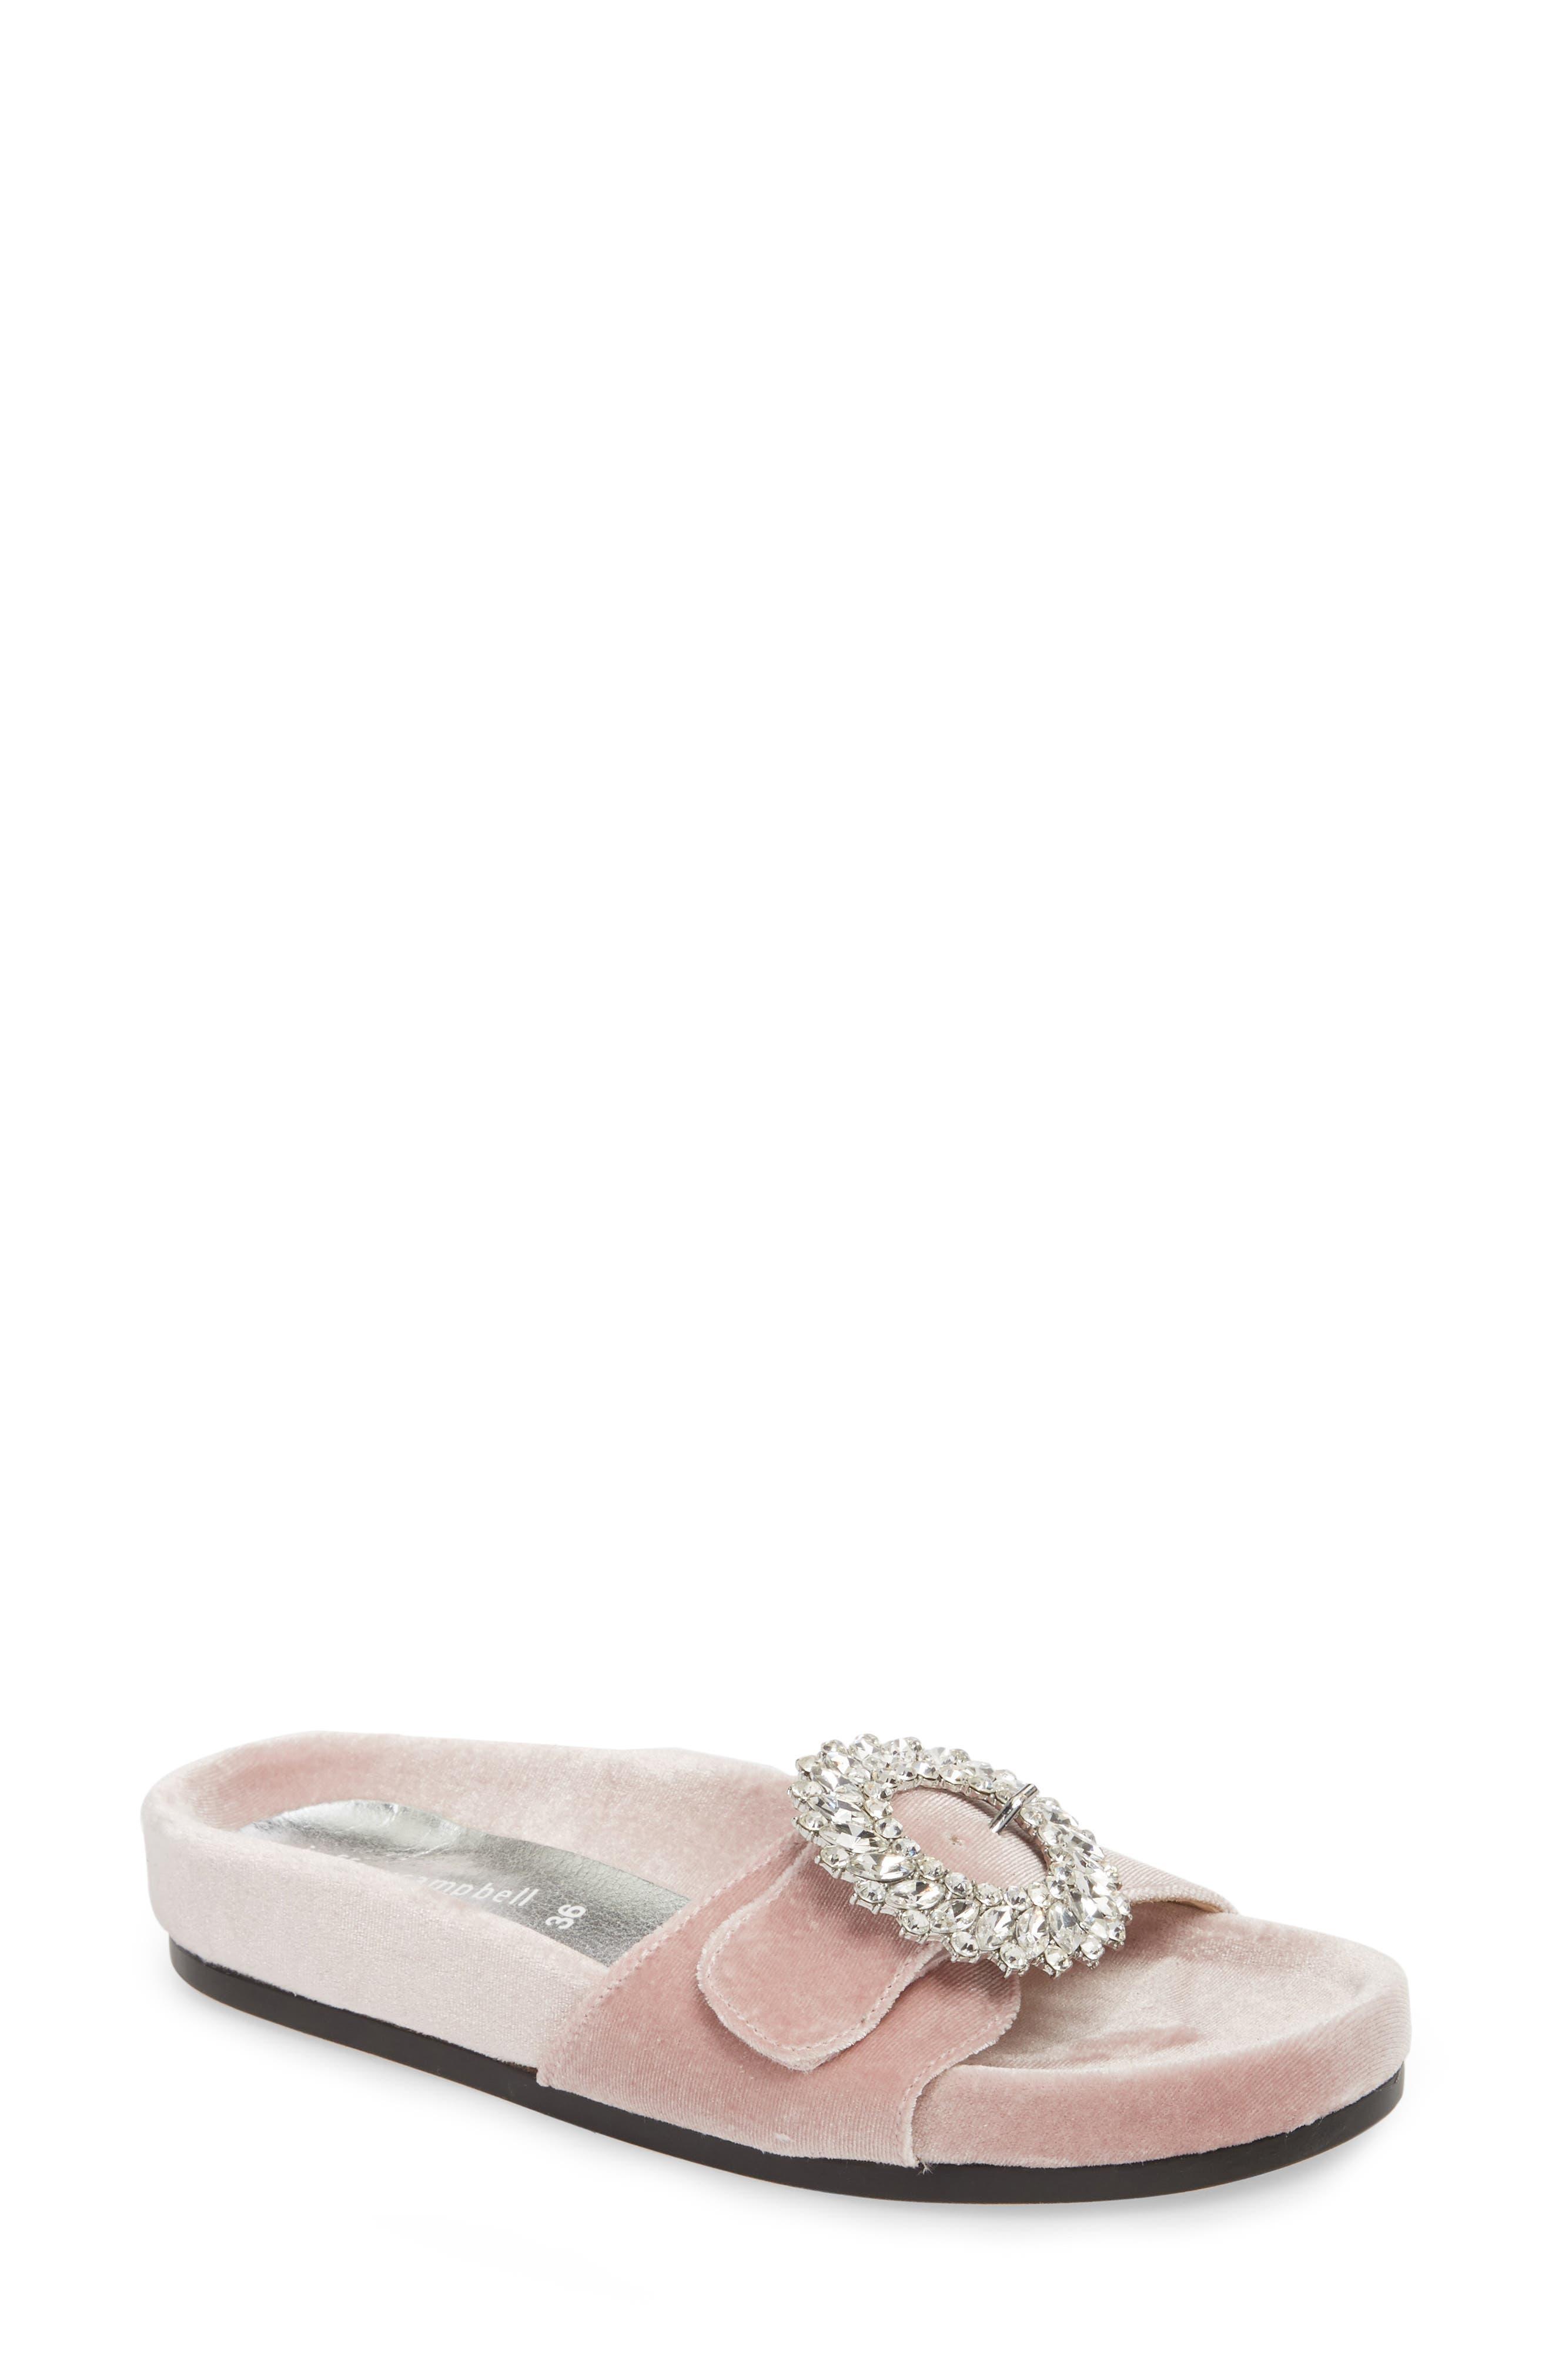 Upolu Embellished Slide Sandal,                             Main thumbnail 1, color,                             Blush Velvet/ Silver